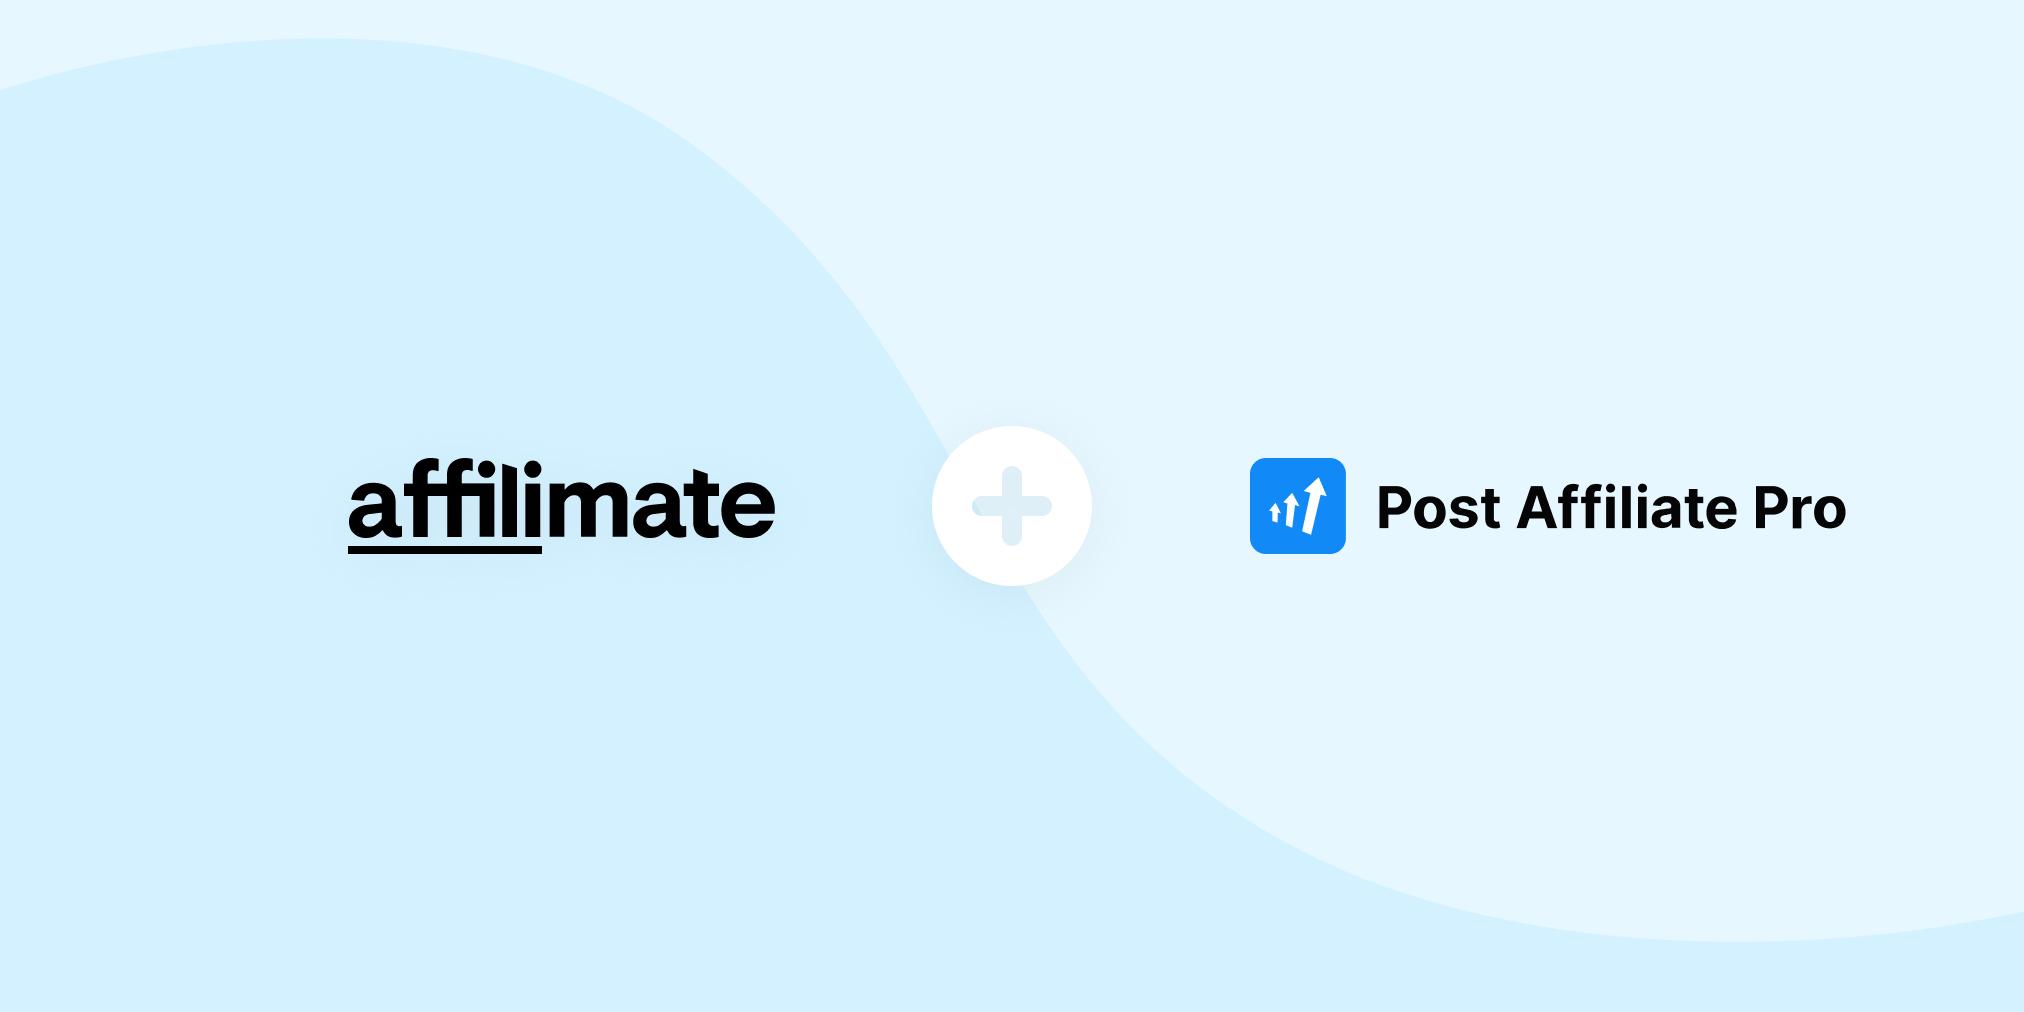 New Integration: Post Affiliate Pro Arrives in Affilimate